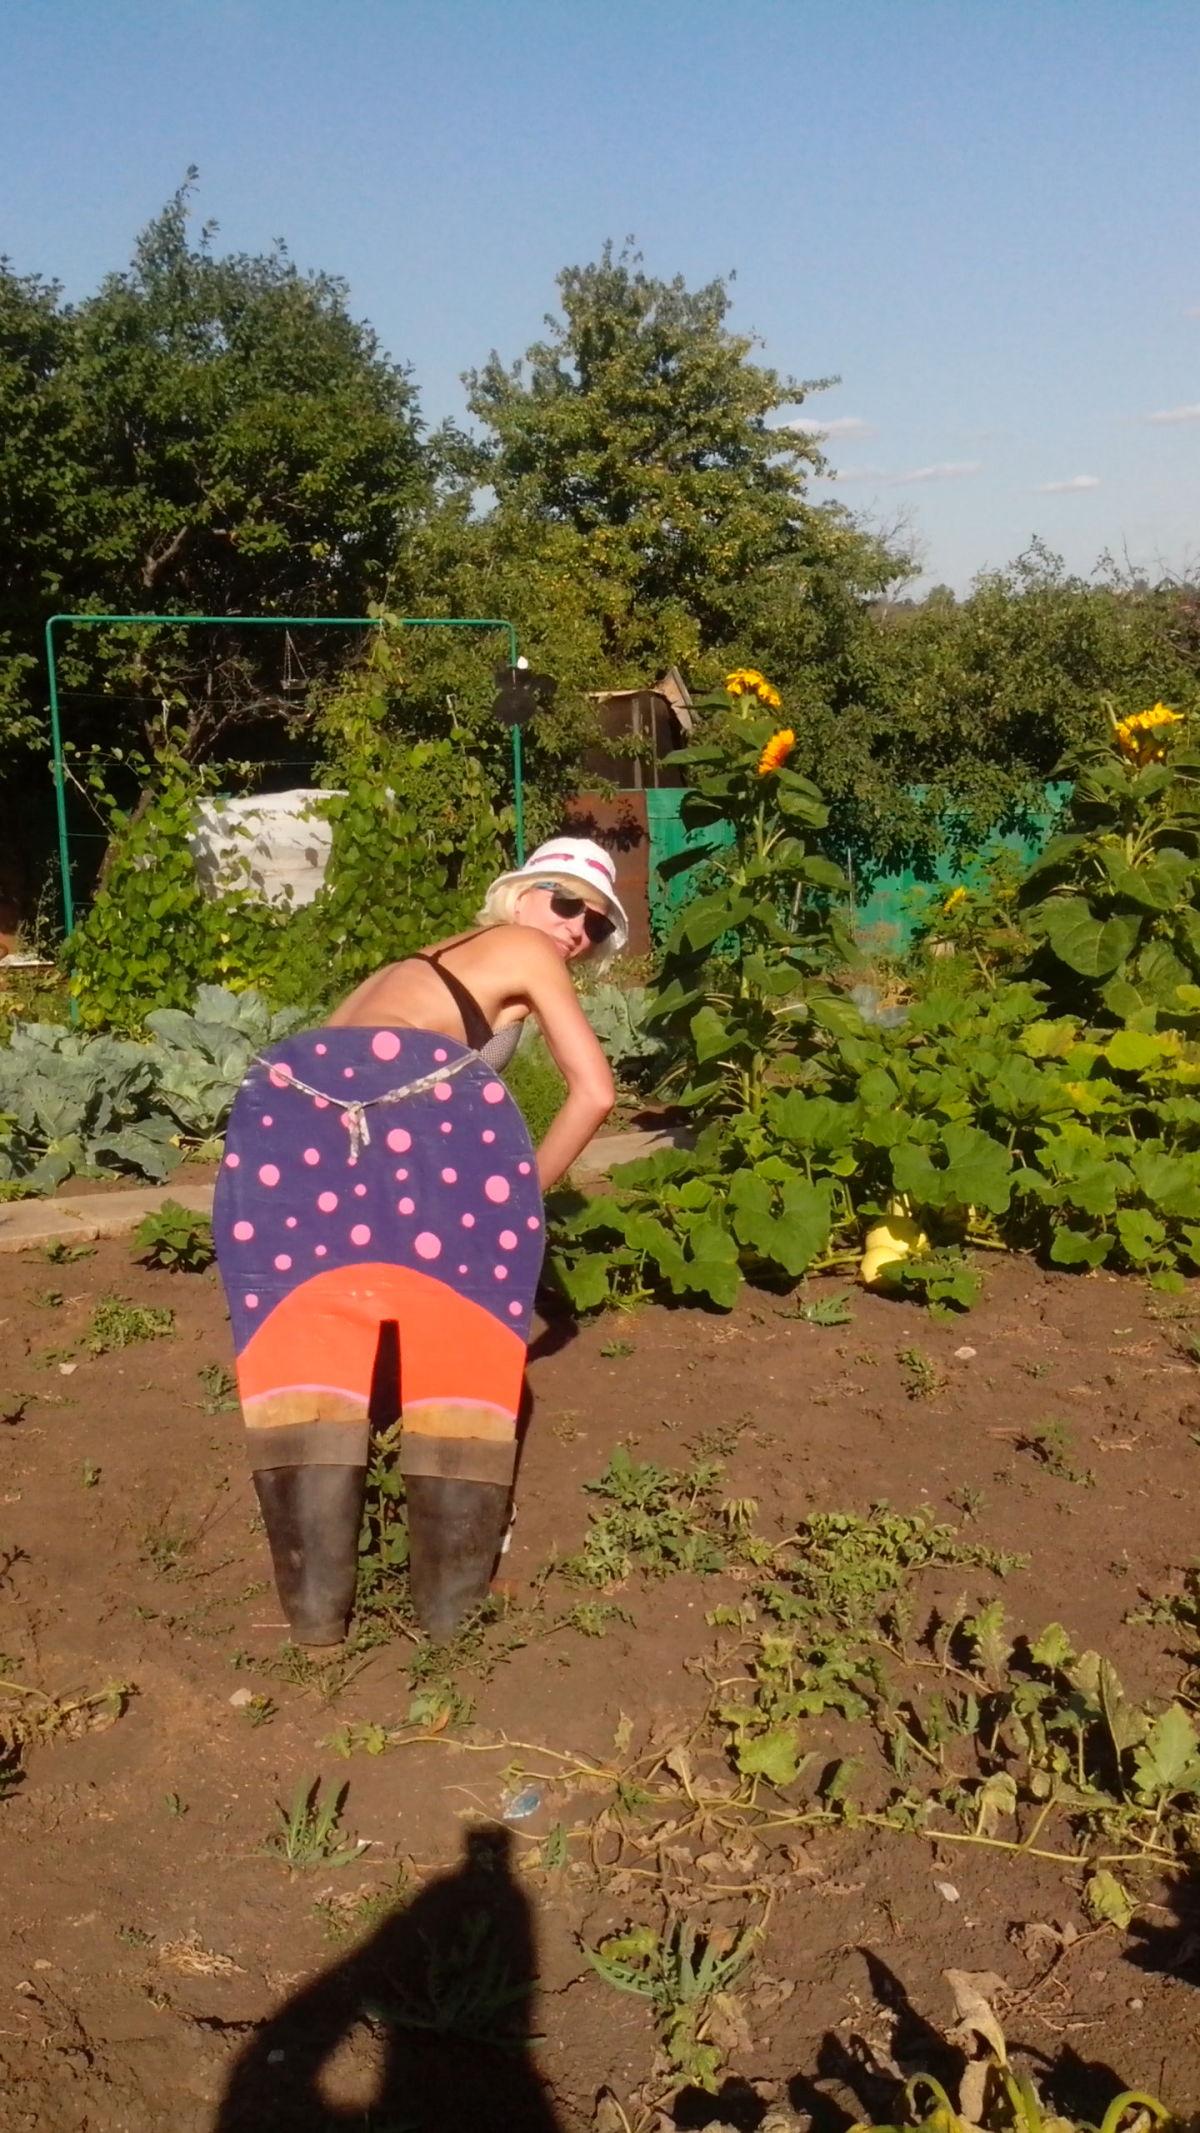 соседка на даче в огороде фото шнуров взорвал интернет